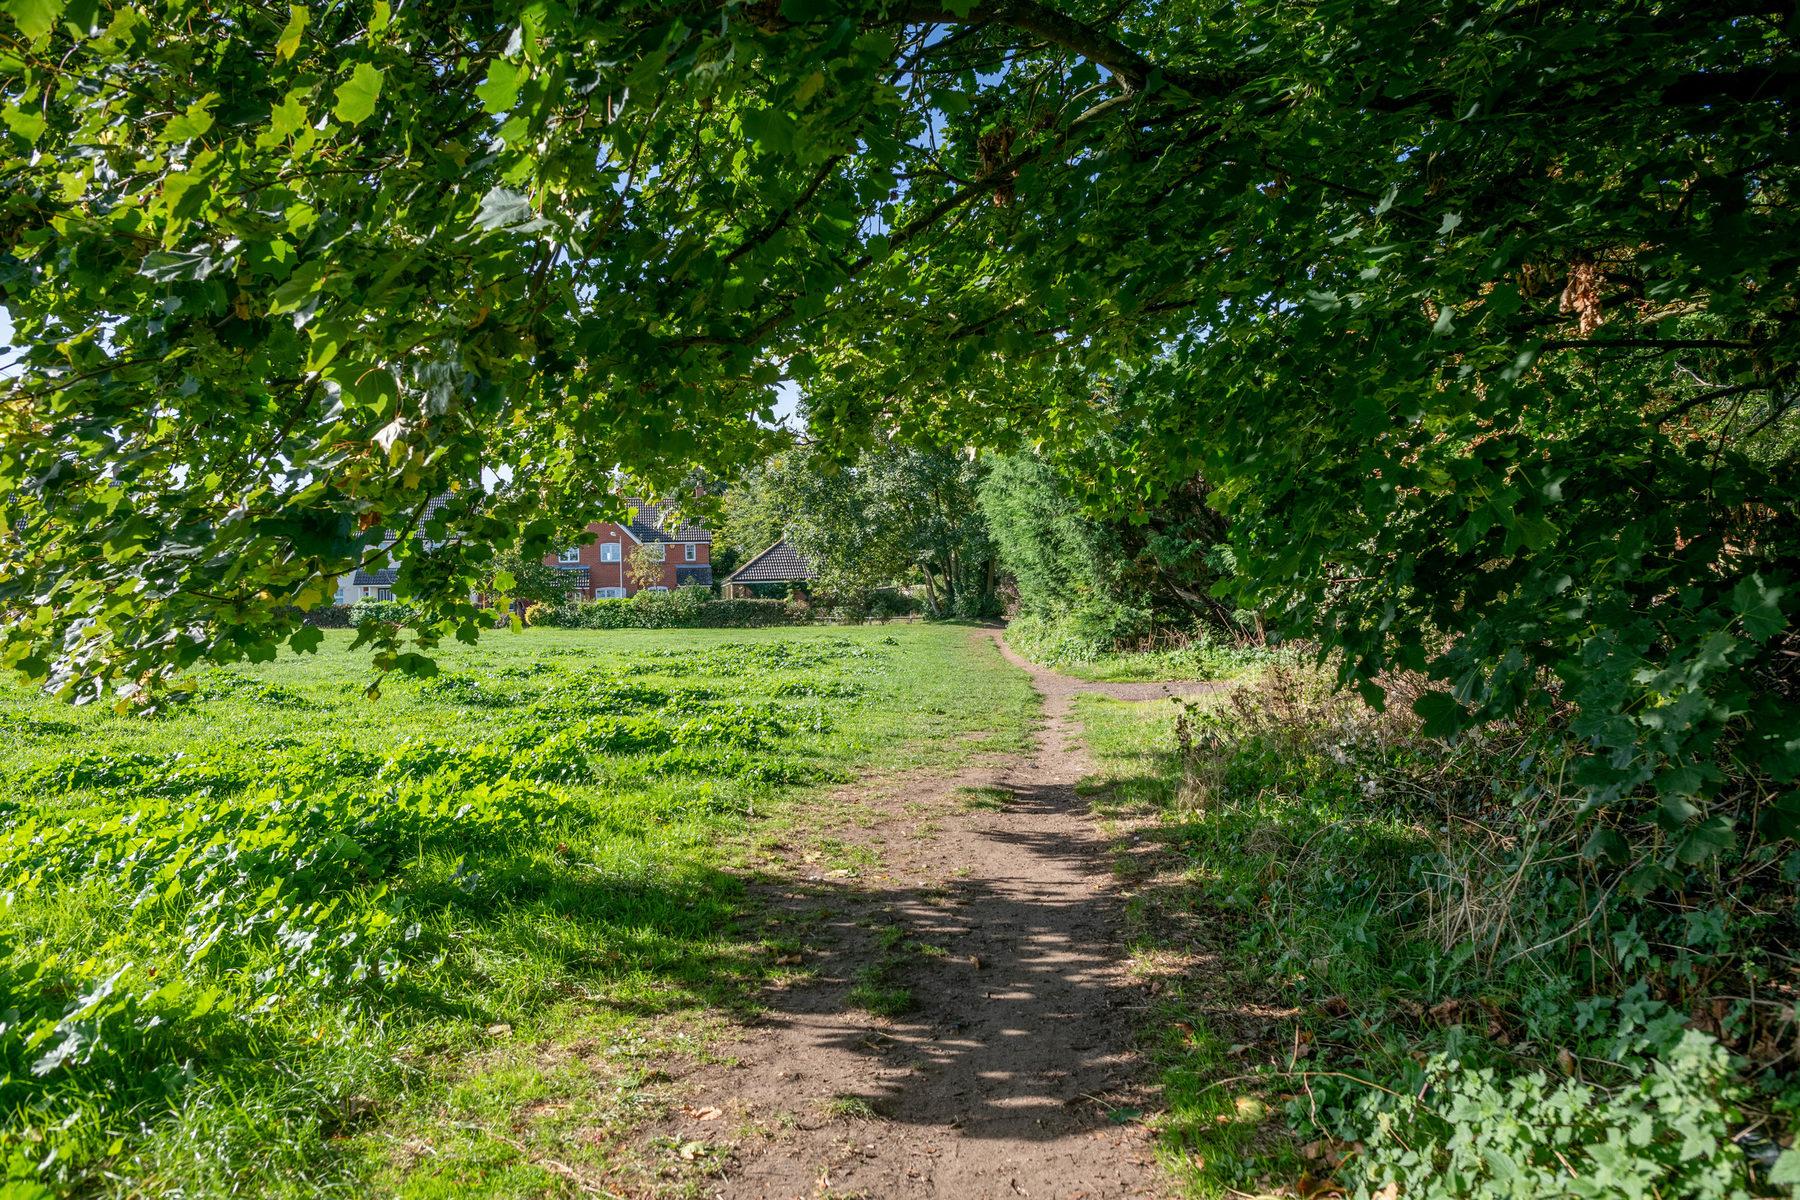 002 Howdale Rabbit Lane 2018